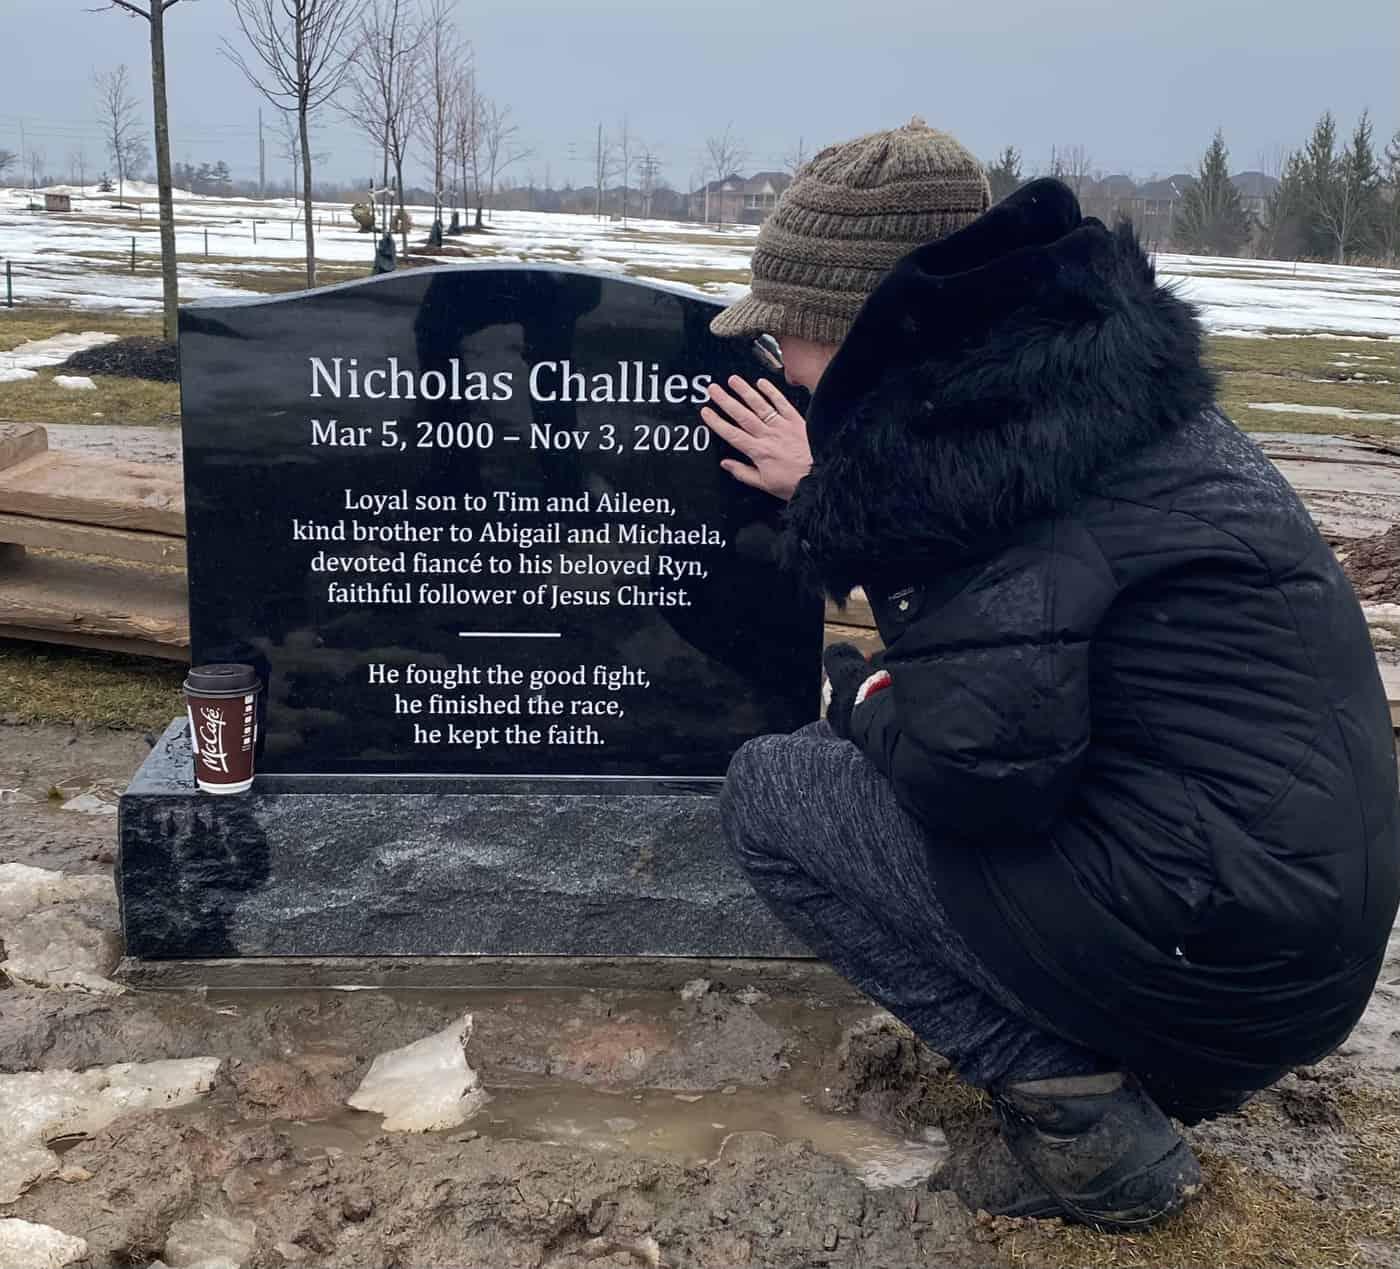 Nick Challies Monument